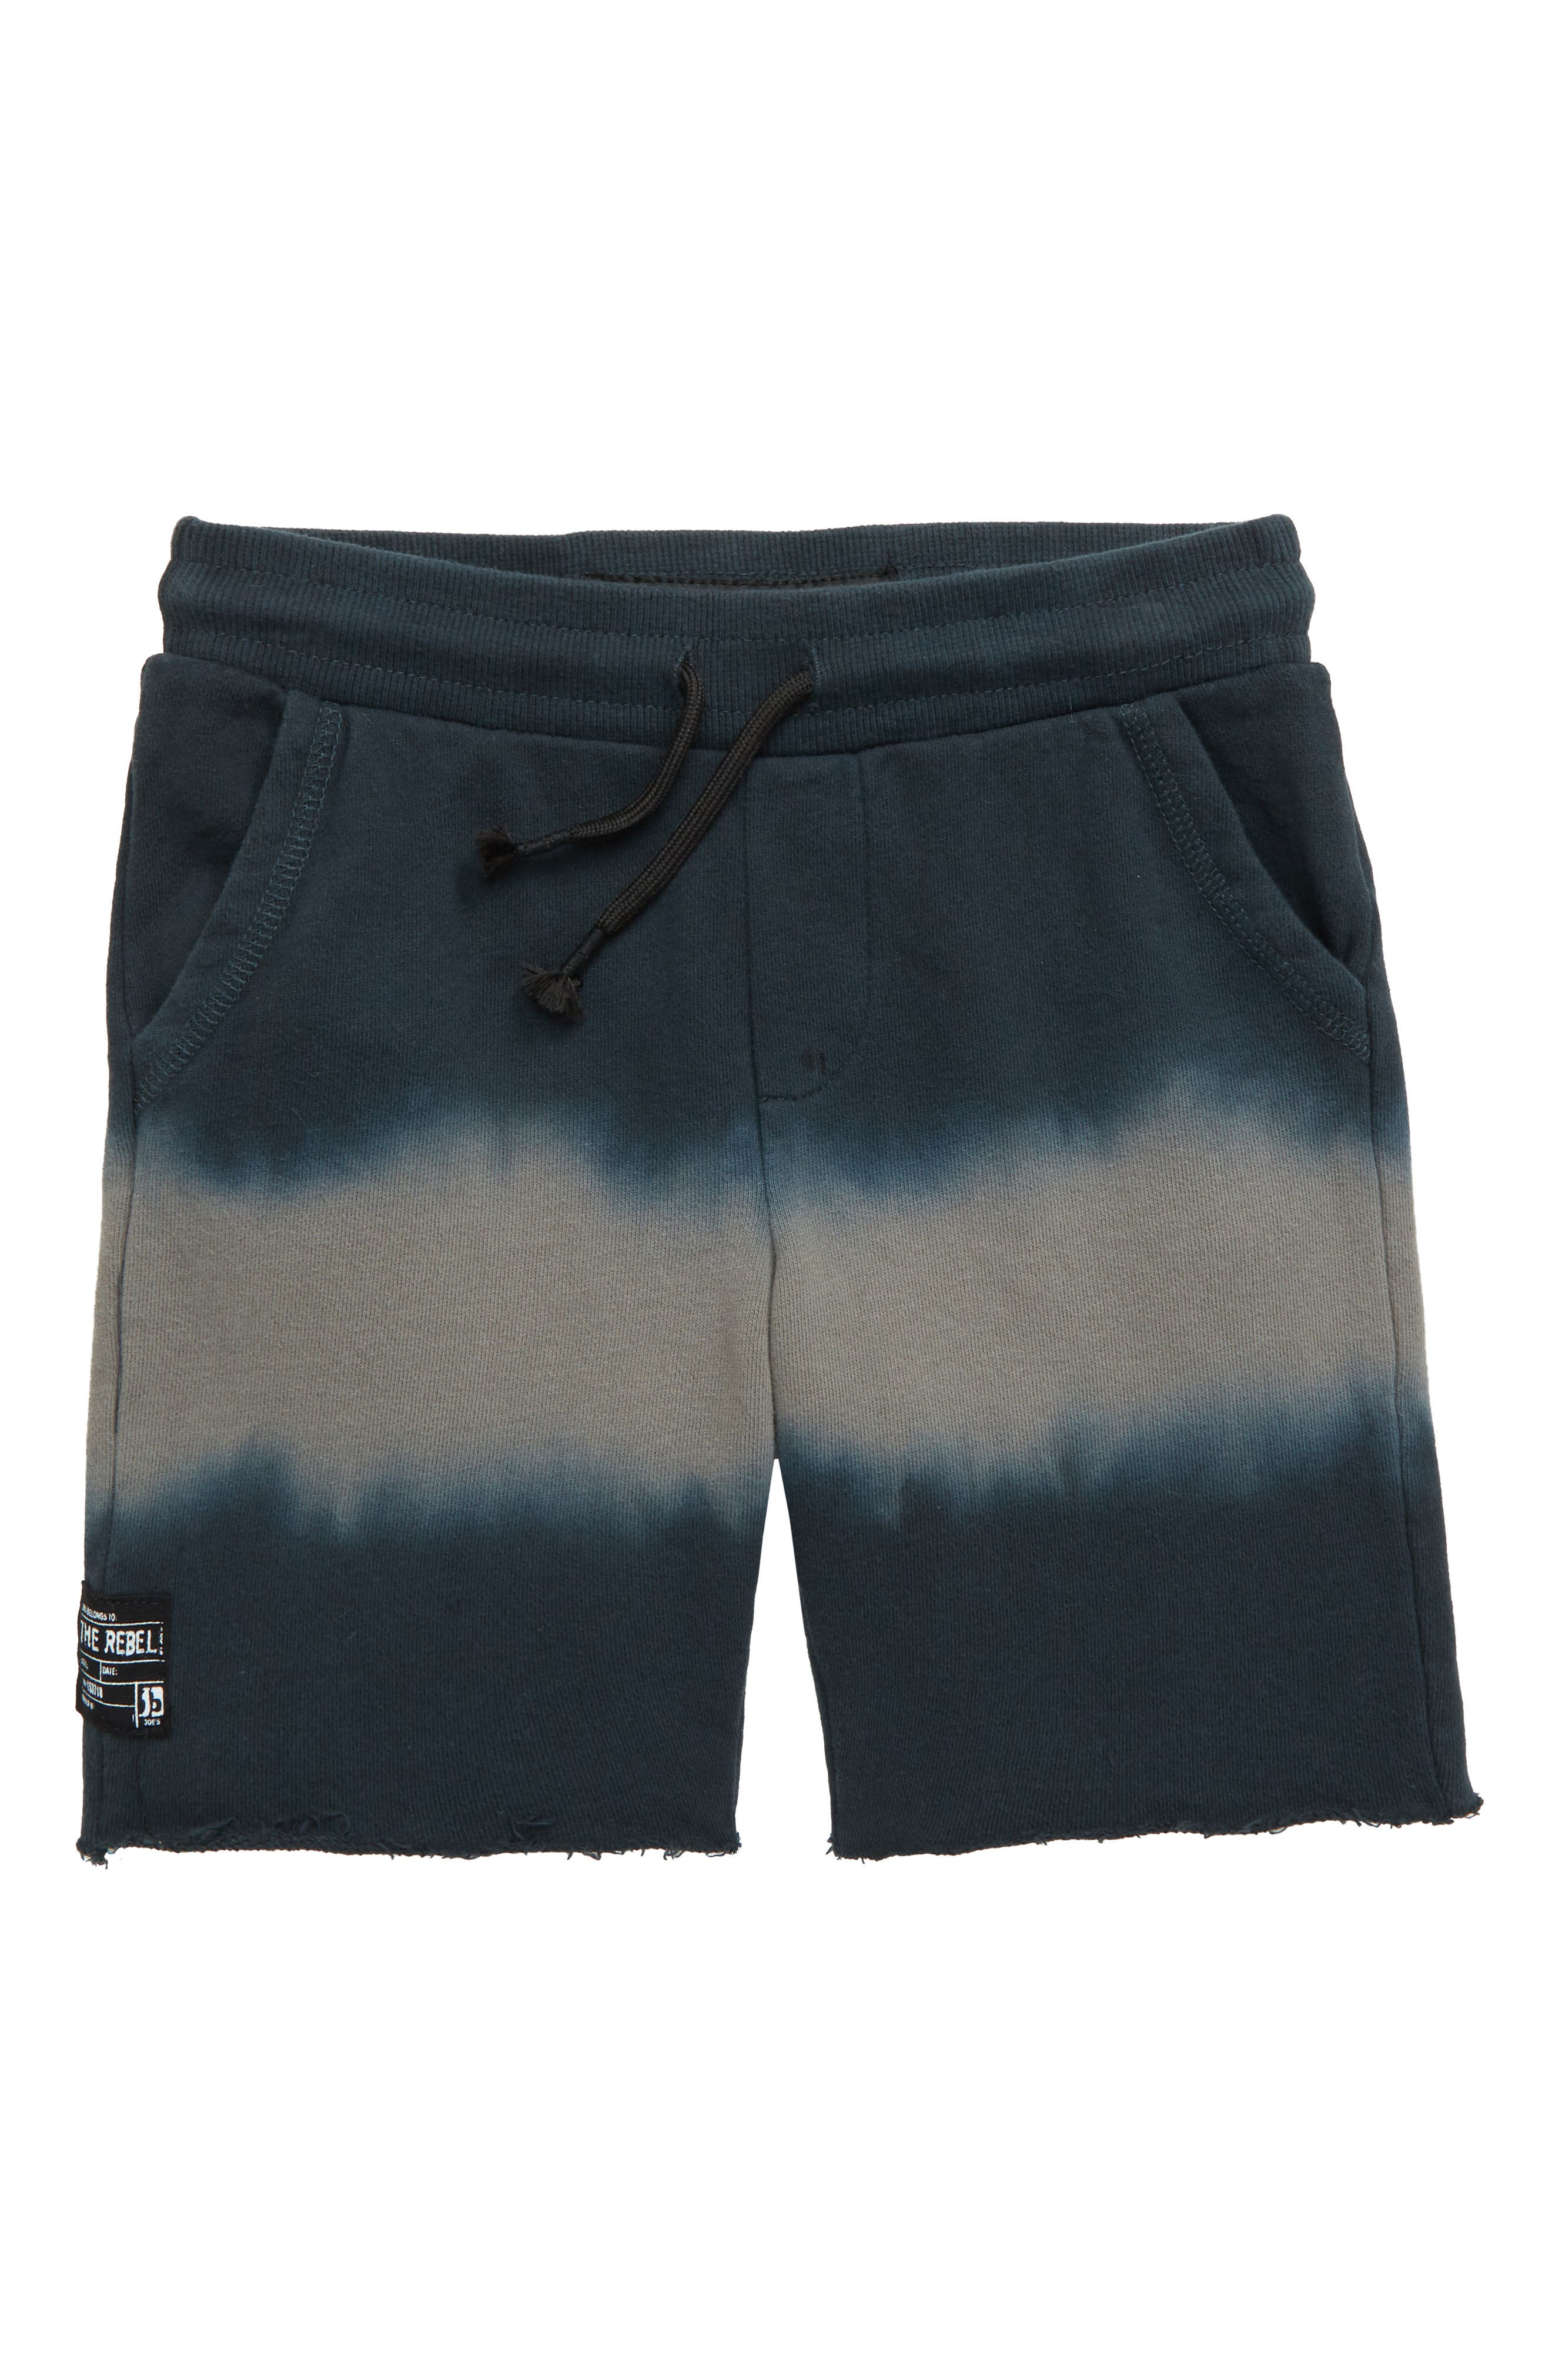 Handmade Size 2.black drill 3 pocket shorts Boys Shorts Toddler boy shorts